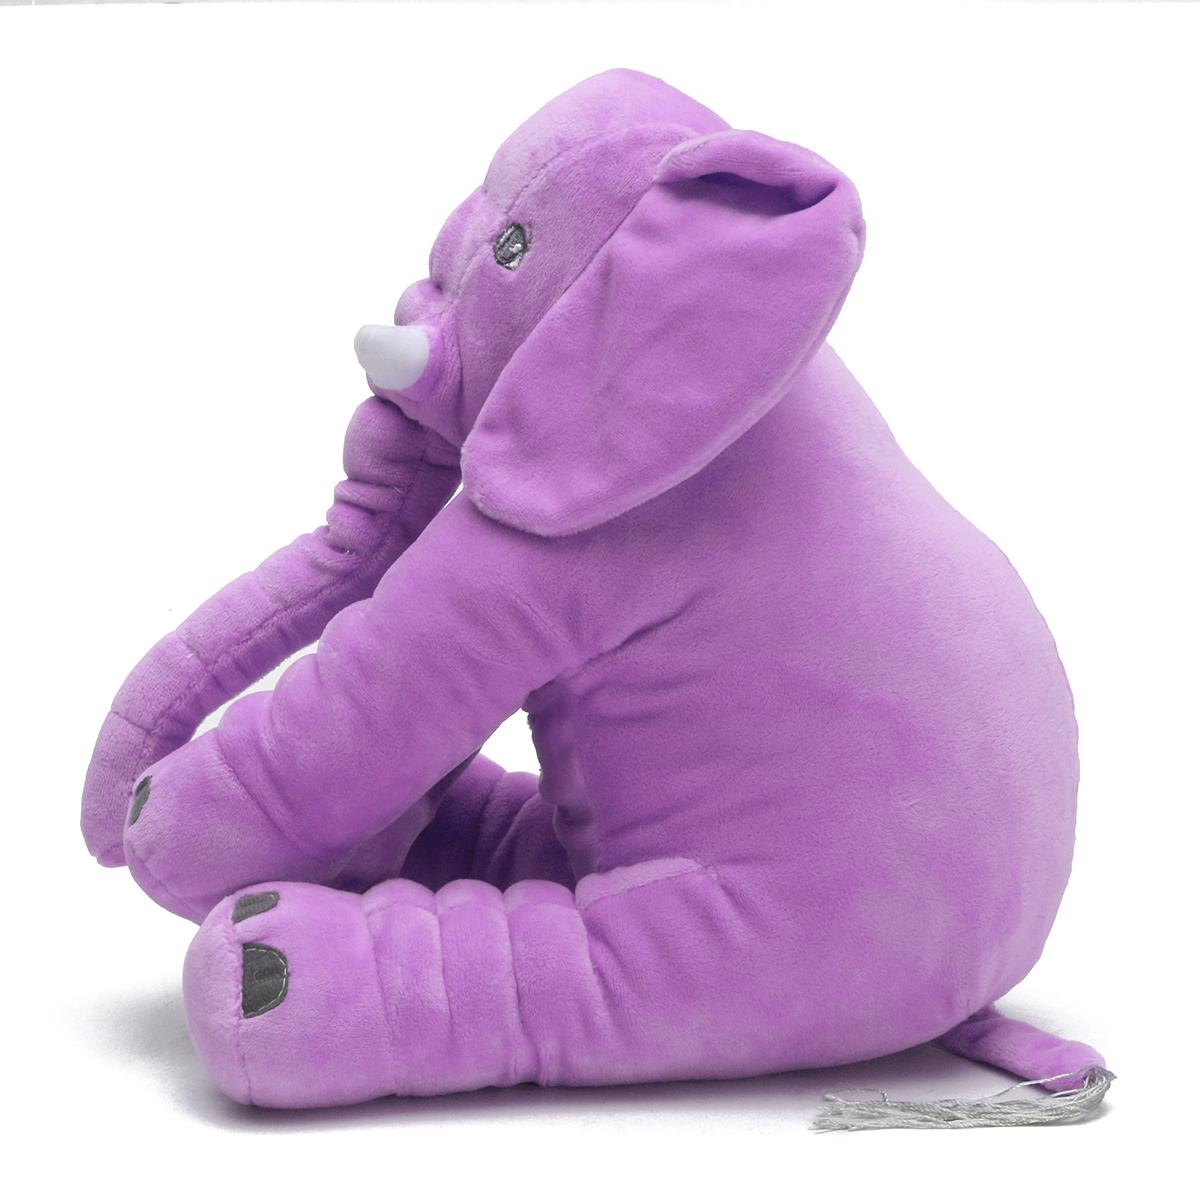 Baby Children/Kids Soft Plush Elephant Sleep Pillow Kids Lumbar Cushion Toys New